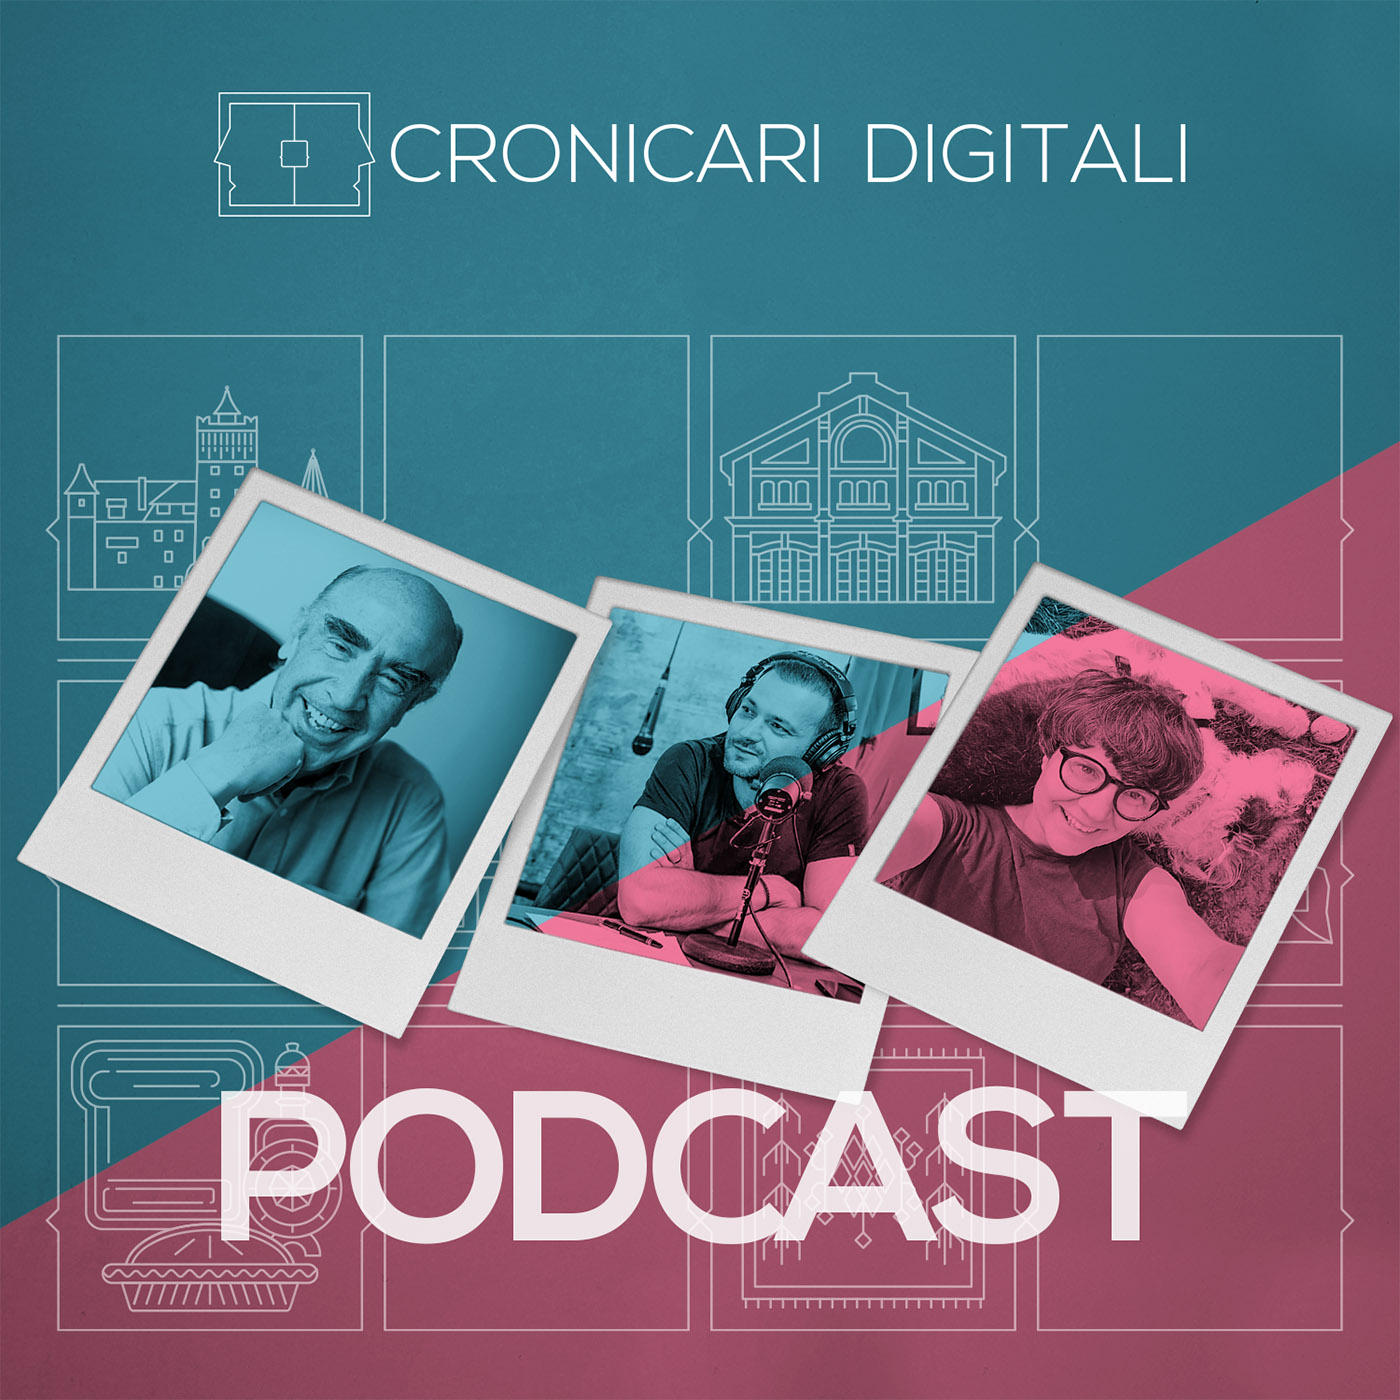 #cronicaridigitali S3 episod 4, Invitați Mihai Morar, Jean Chrissoveloni și Mona Petre